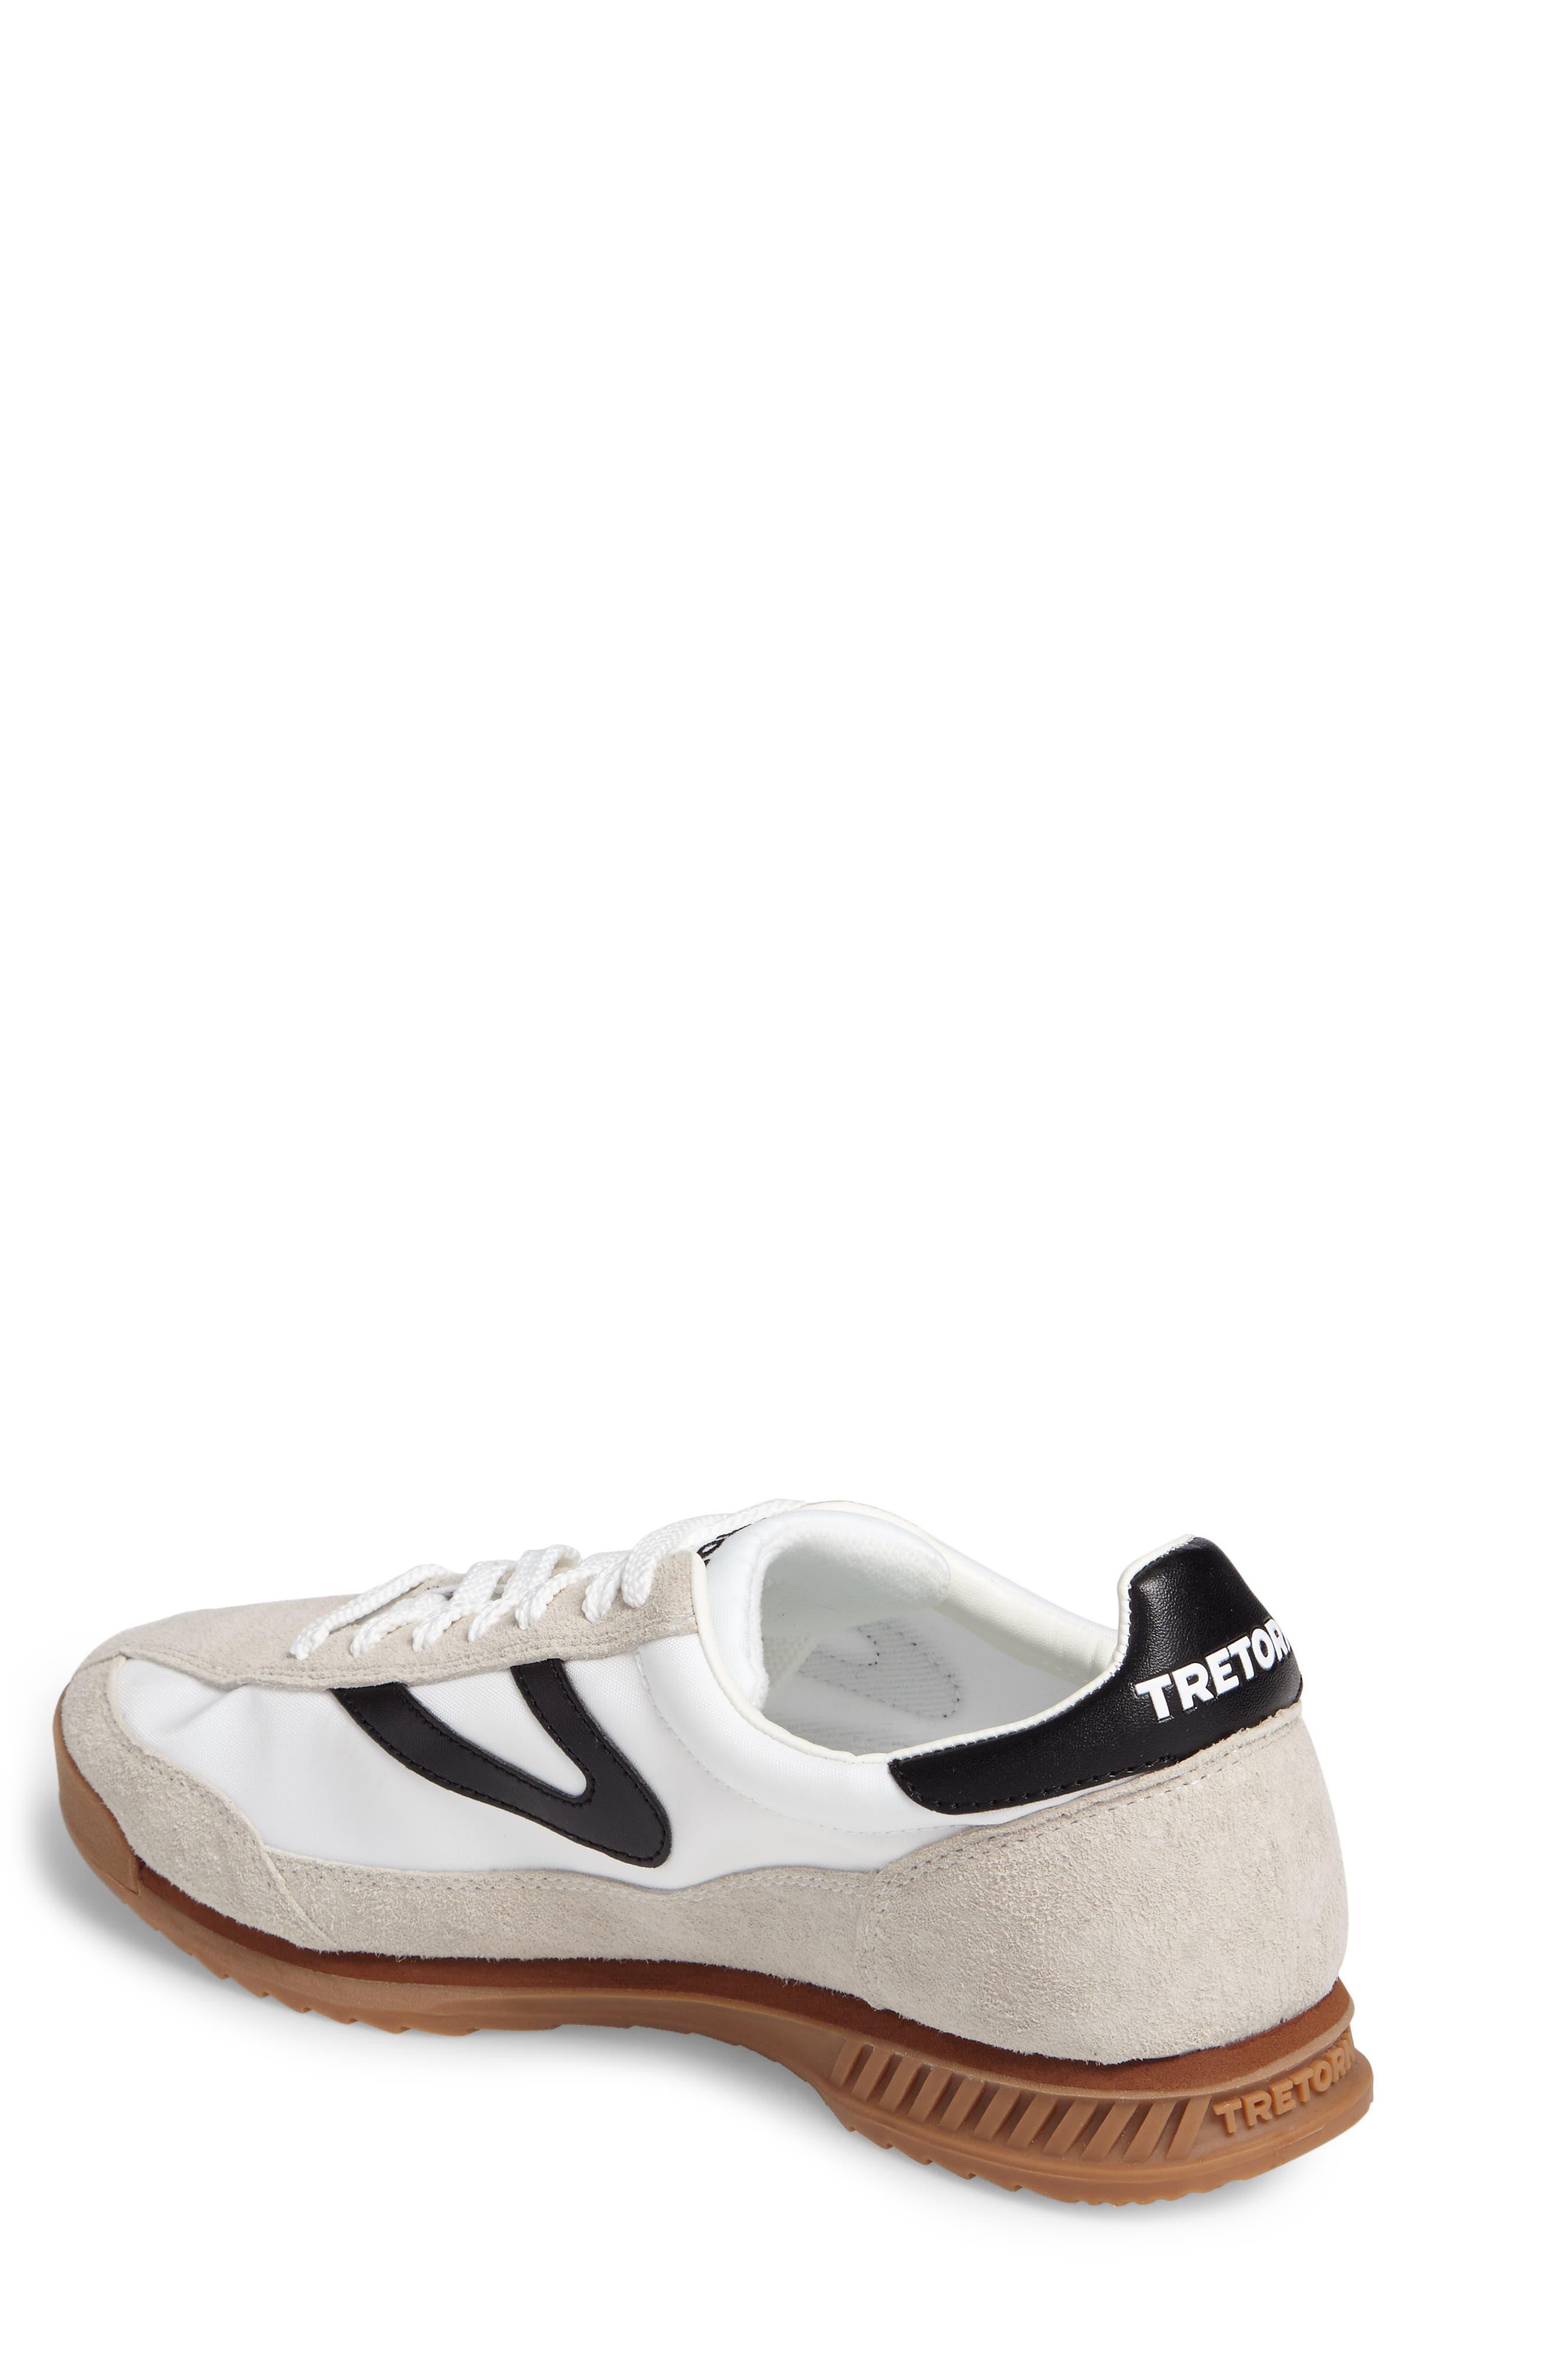 Rawlins 3 Sneaker,                             Alternate thumbnail 2, color,                             100